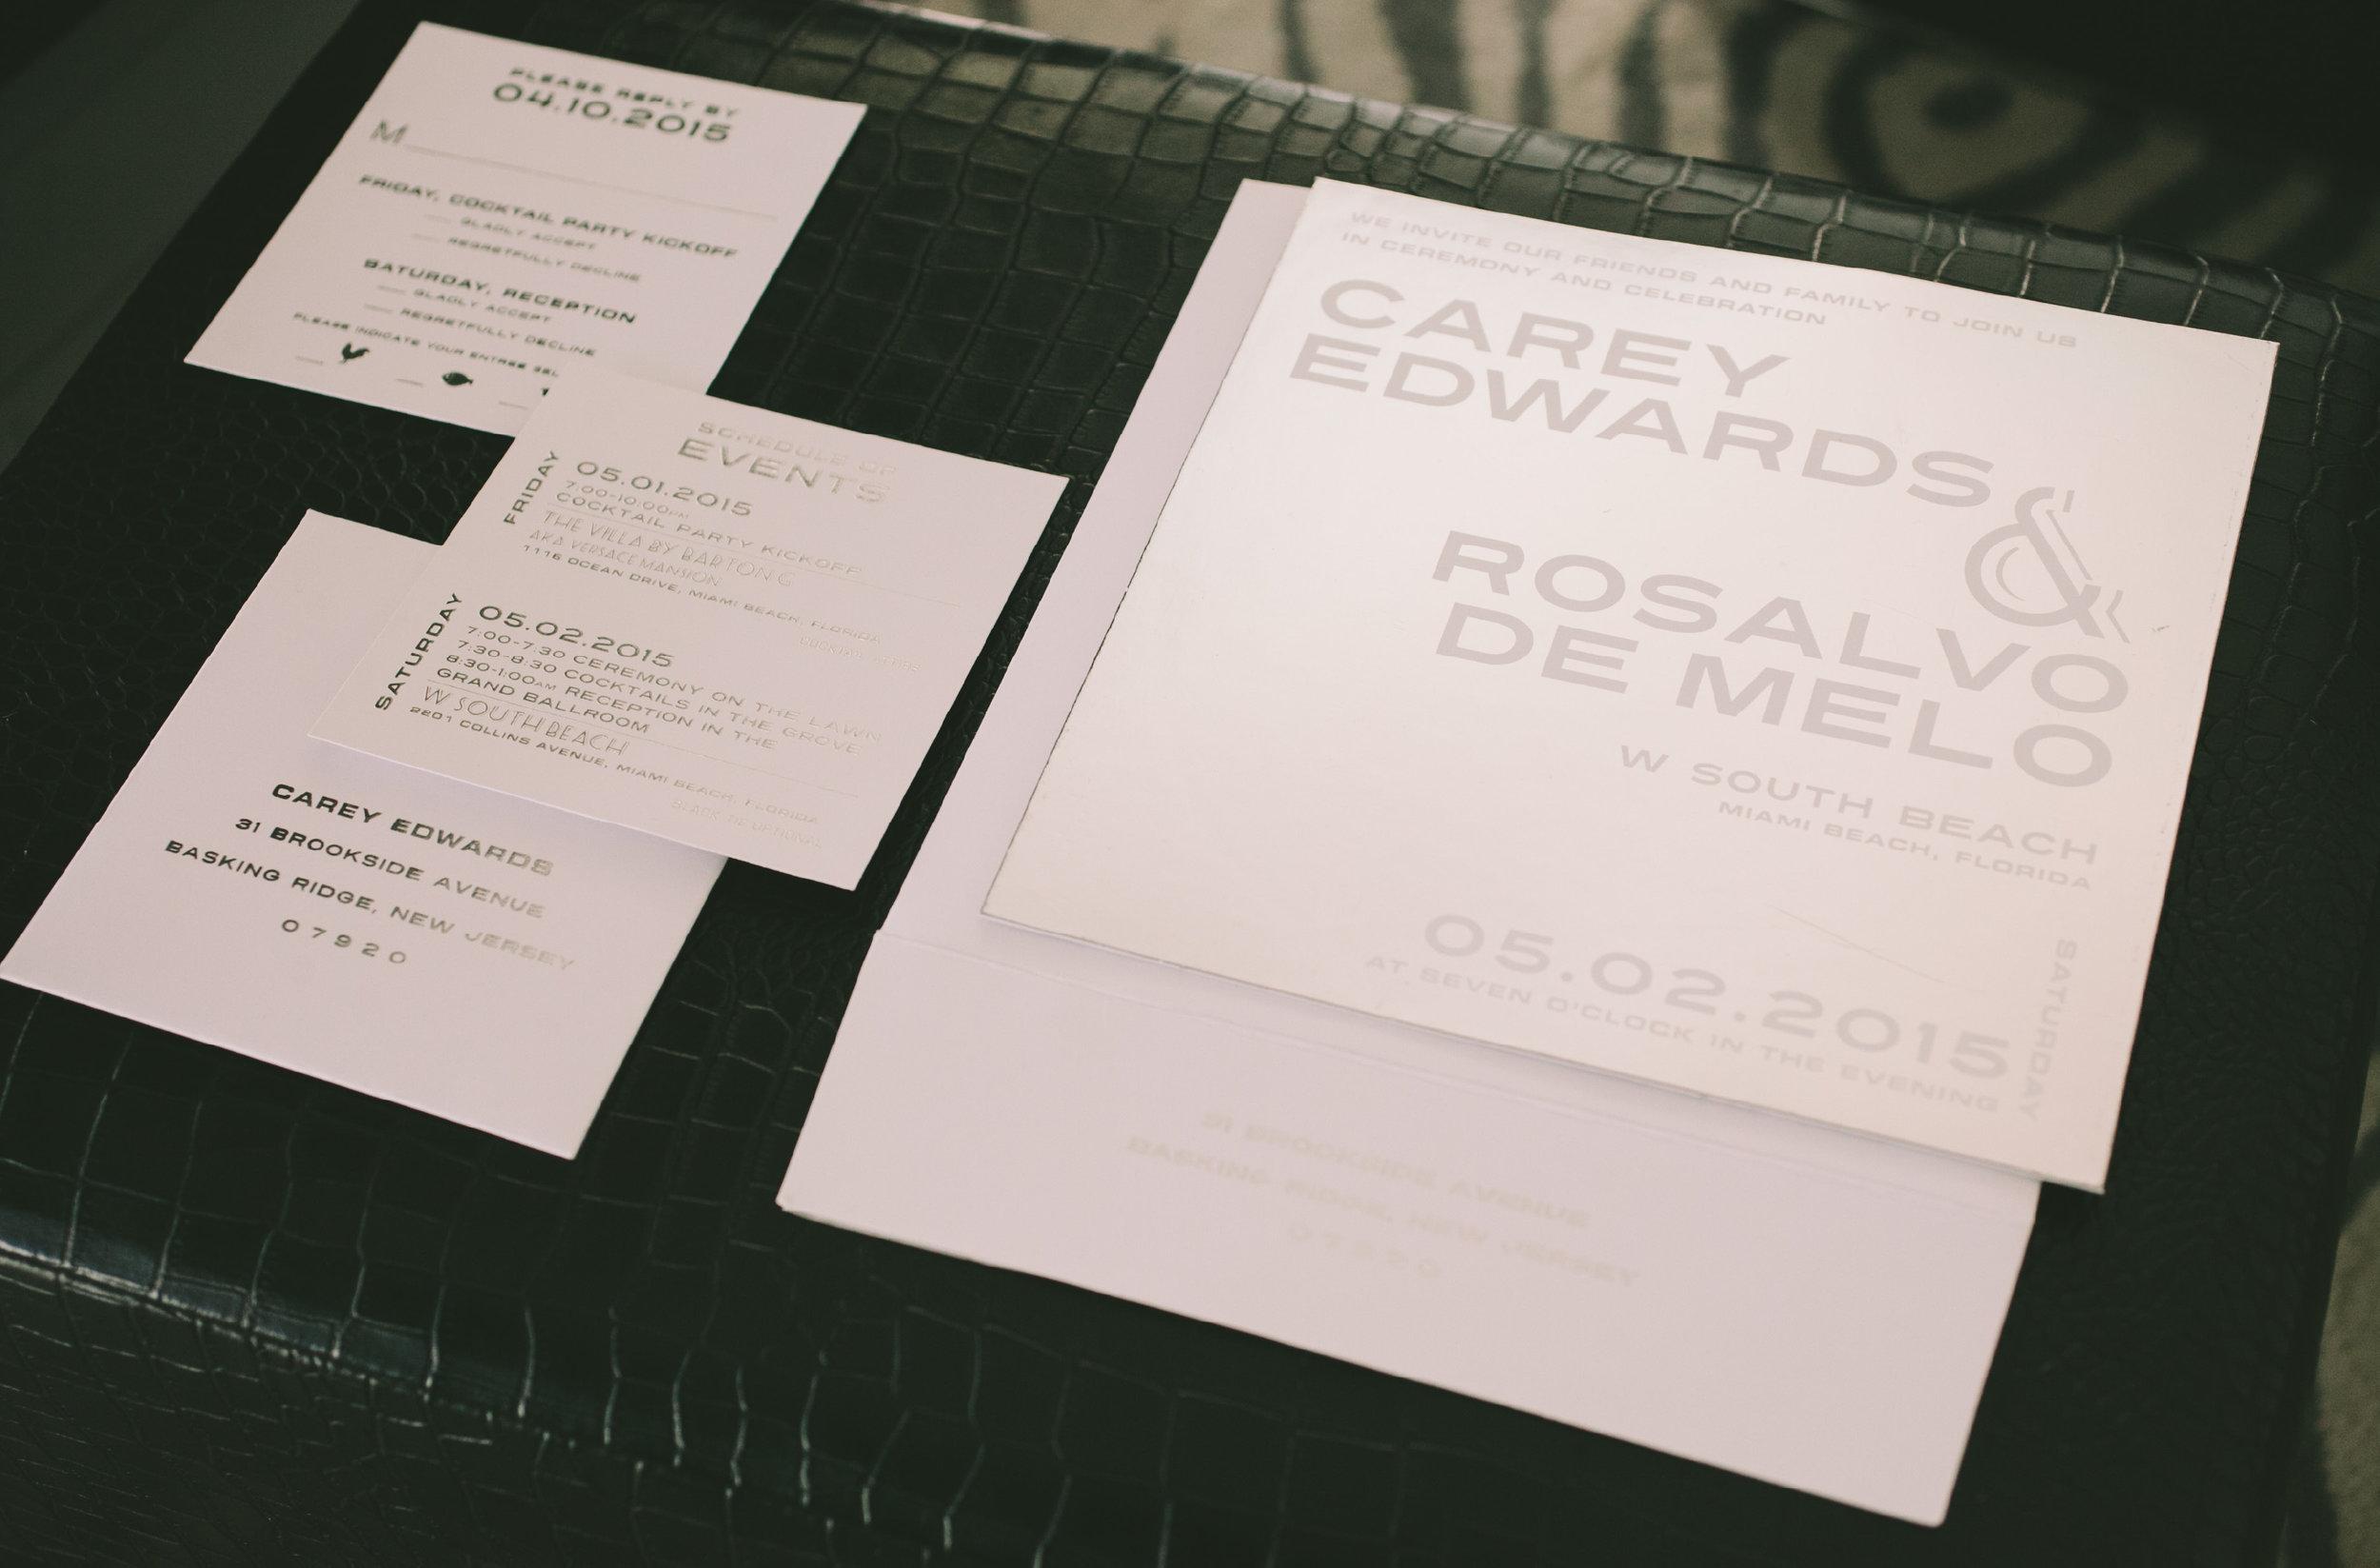 Carey + Rosalvo W South Beach Miami Wedding9.jpg